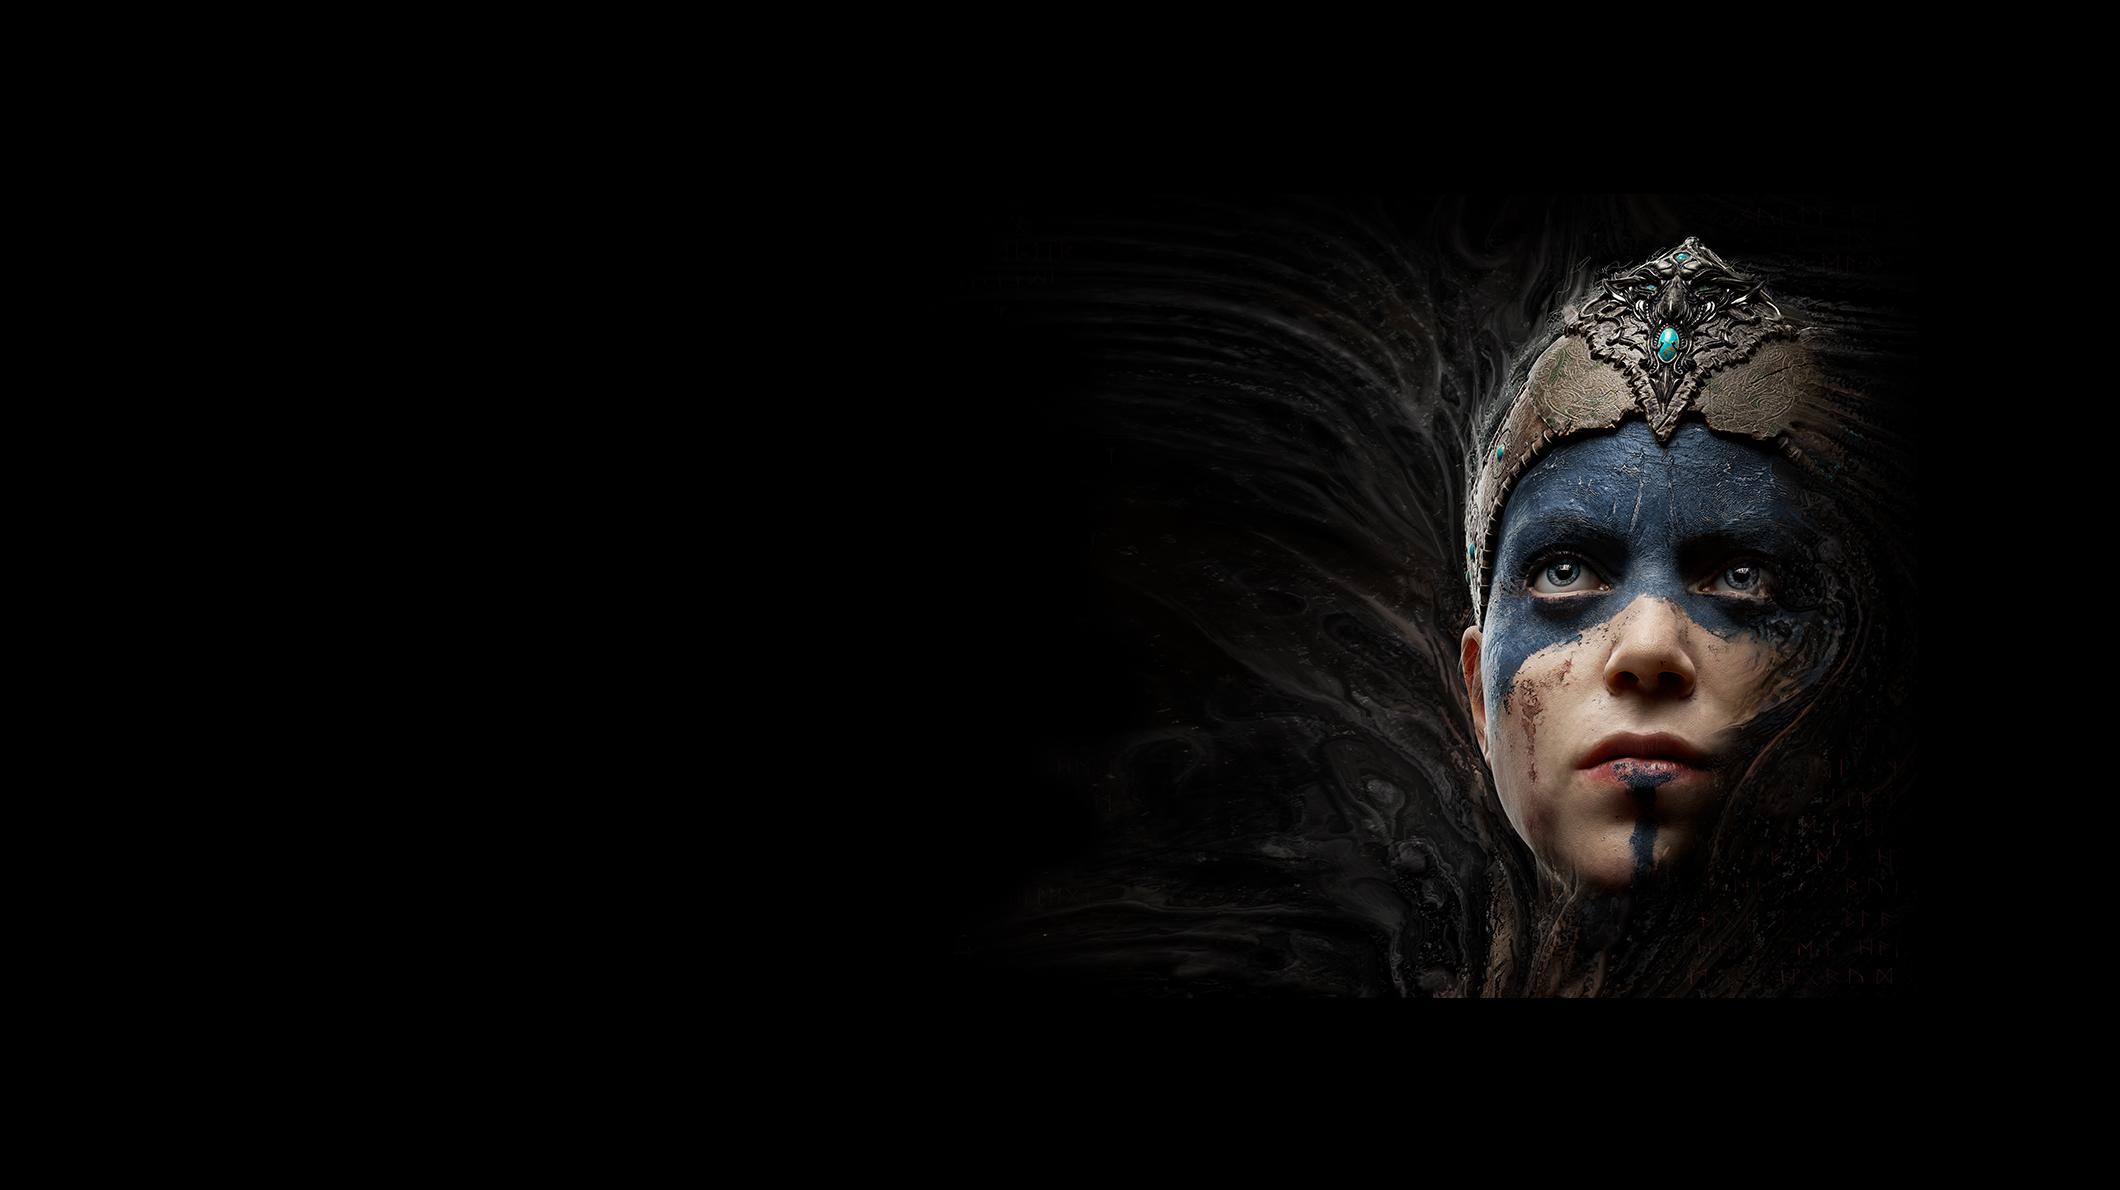 Hellblade: Senua's Sacrifice for Xbox One